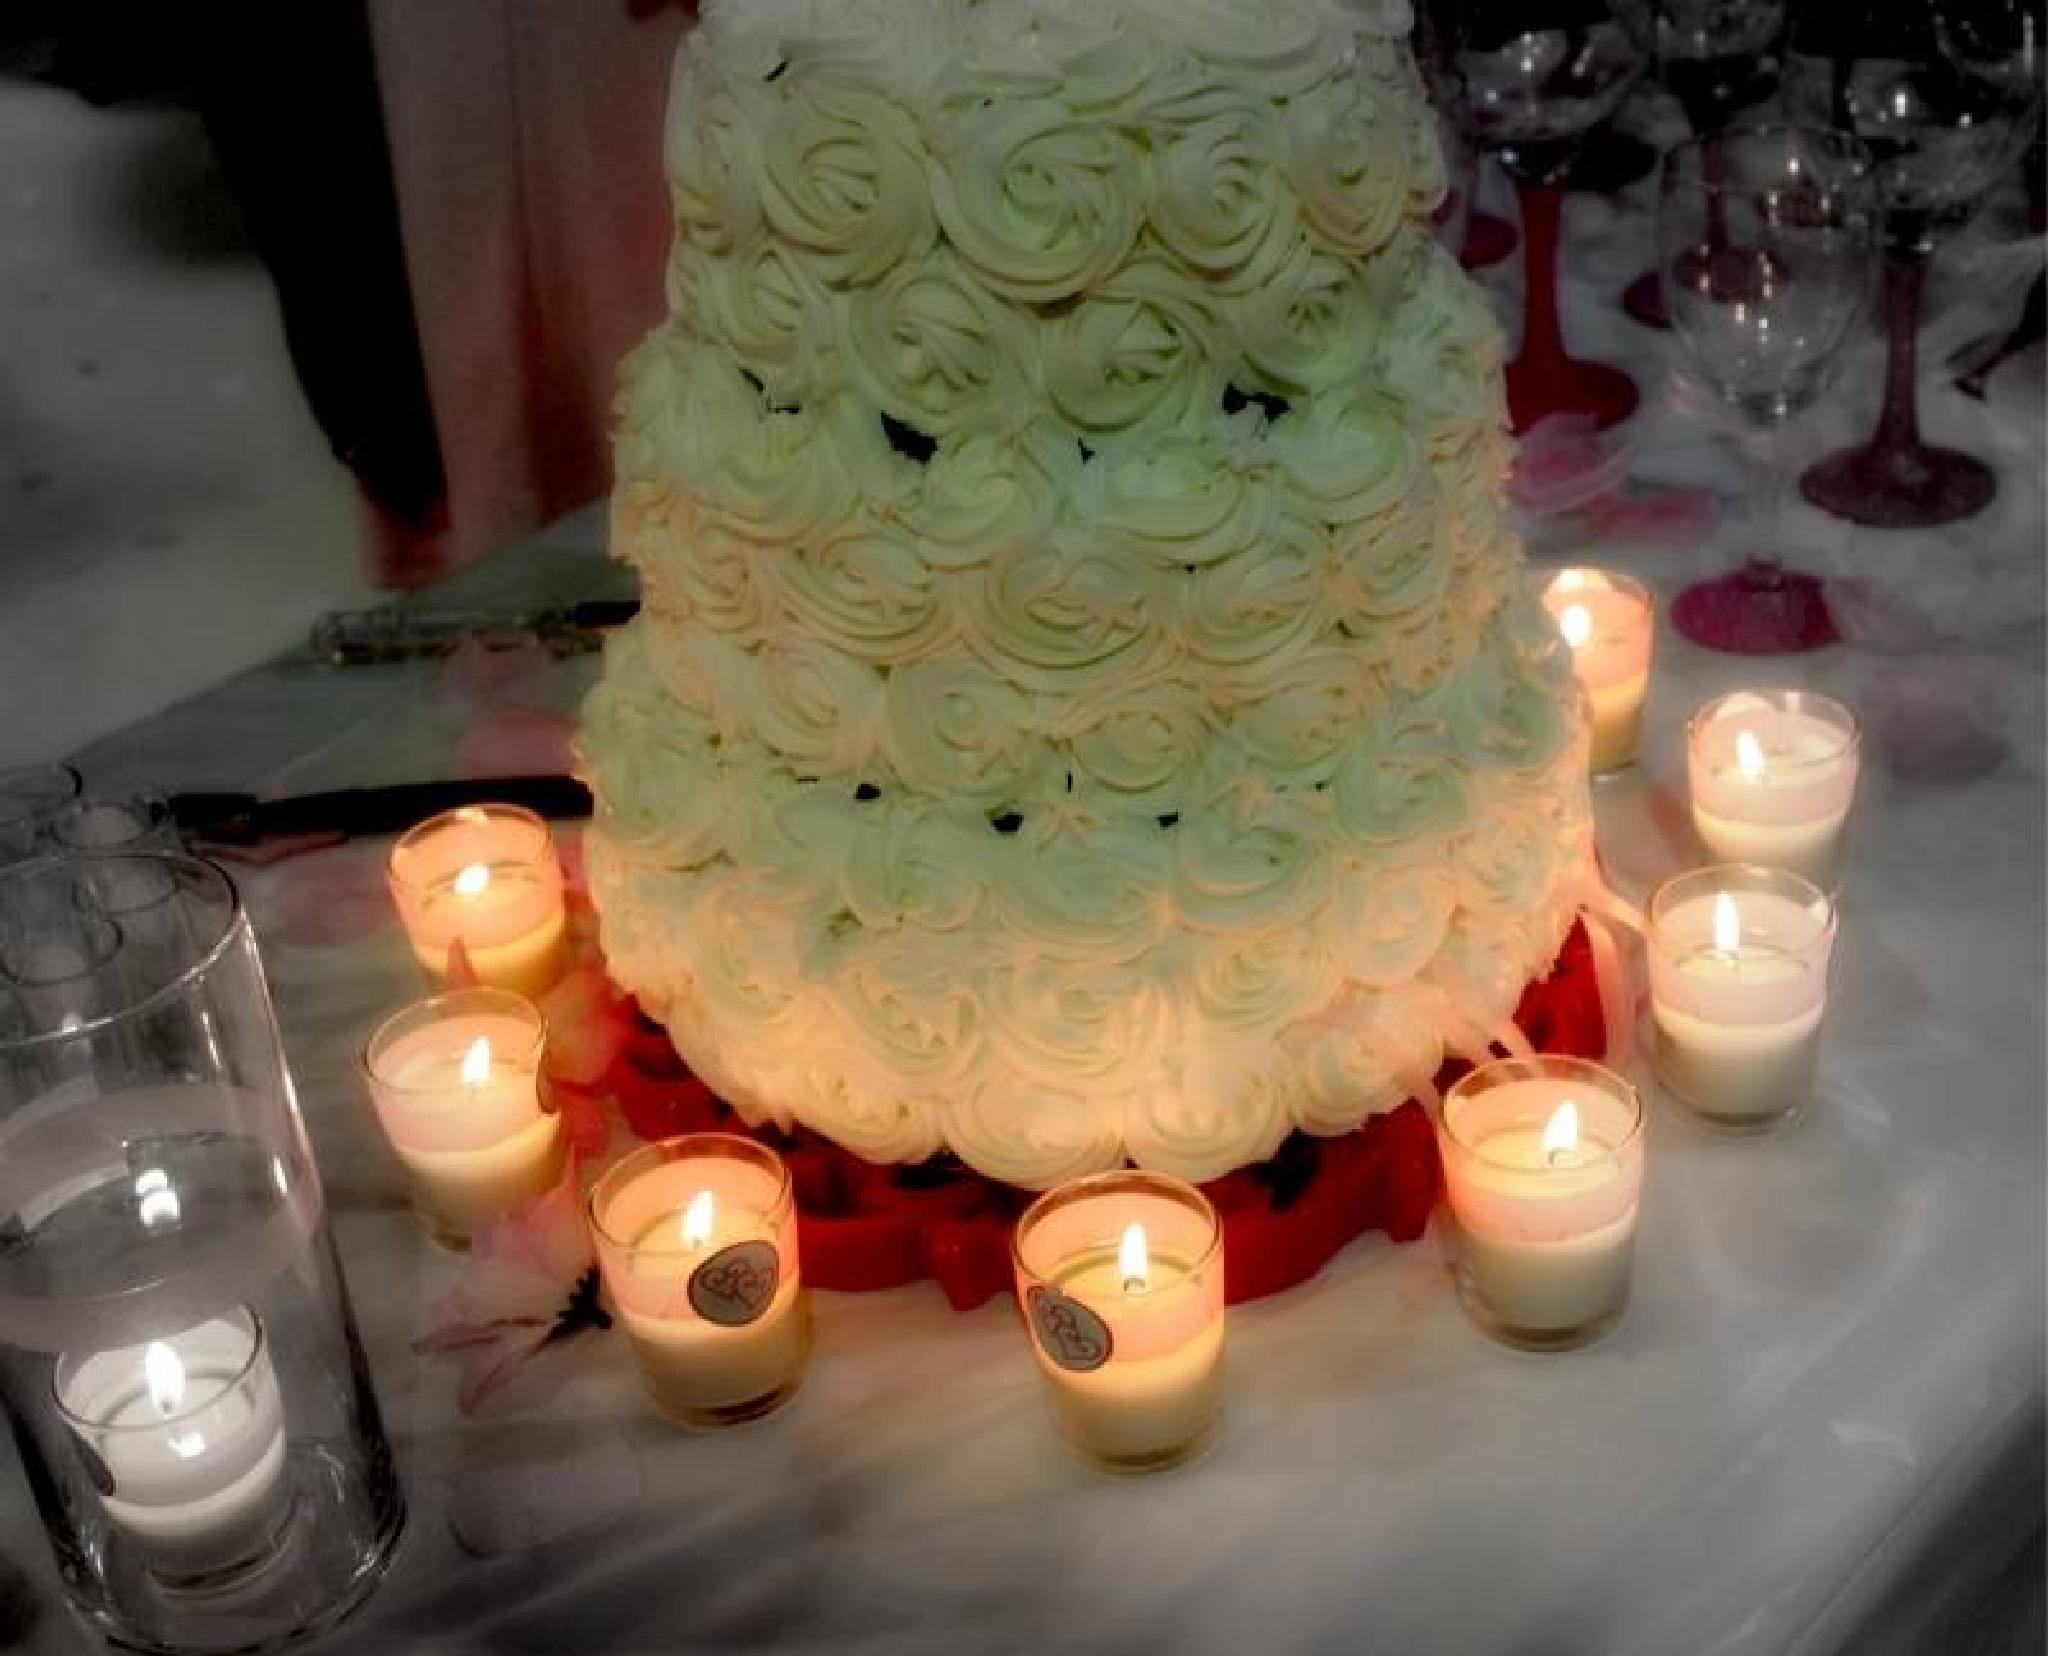 The Wedding Cake by Lisa BluWolf Sahani